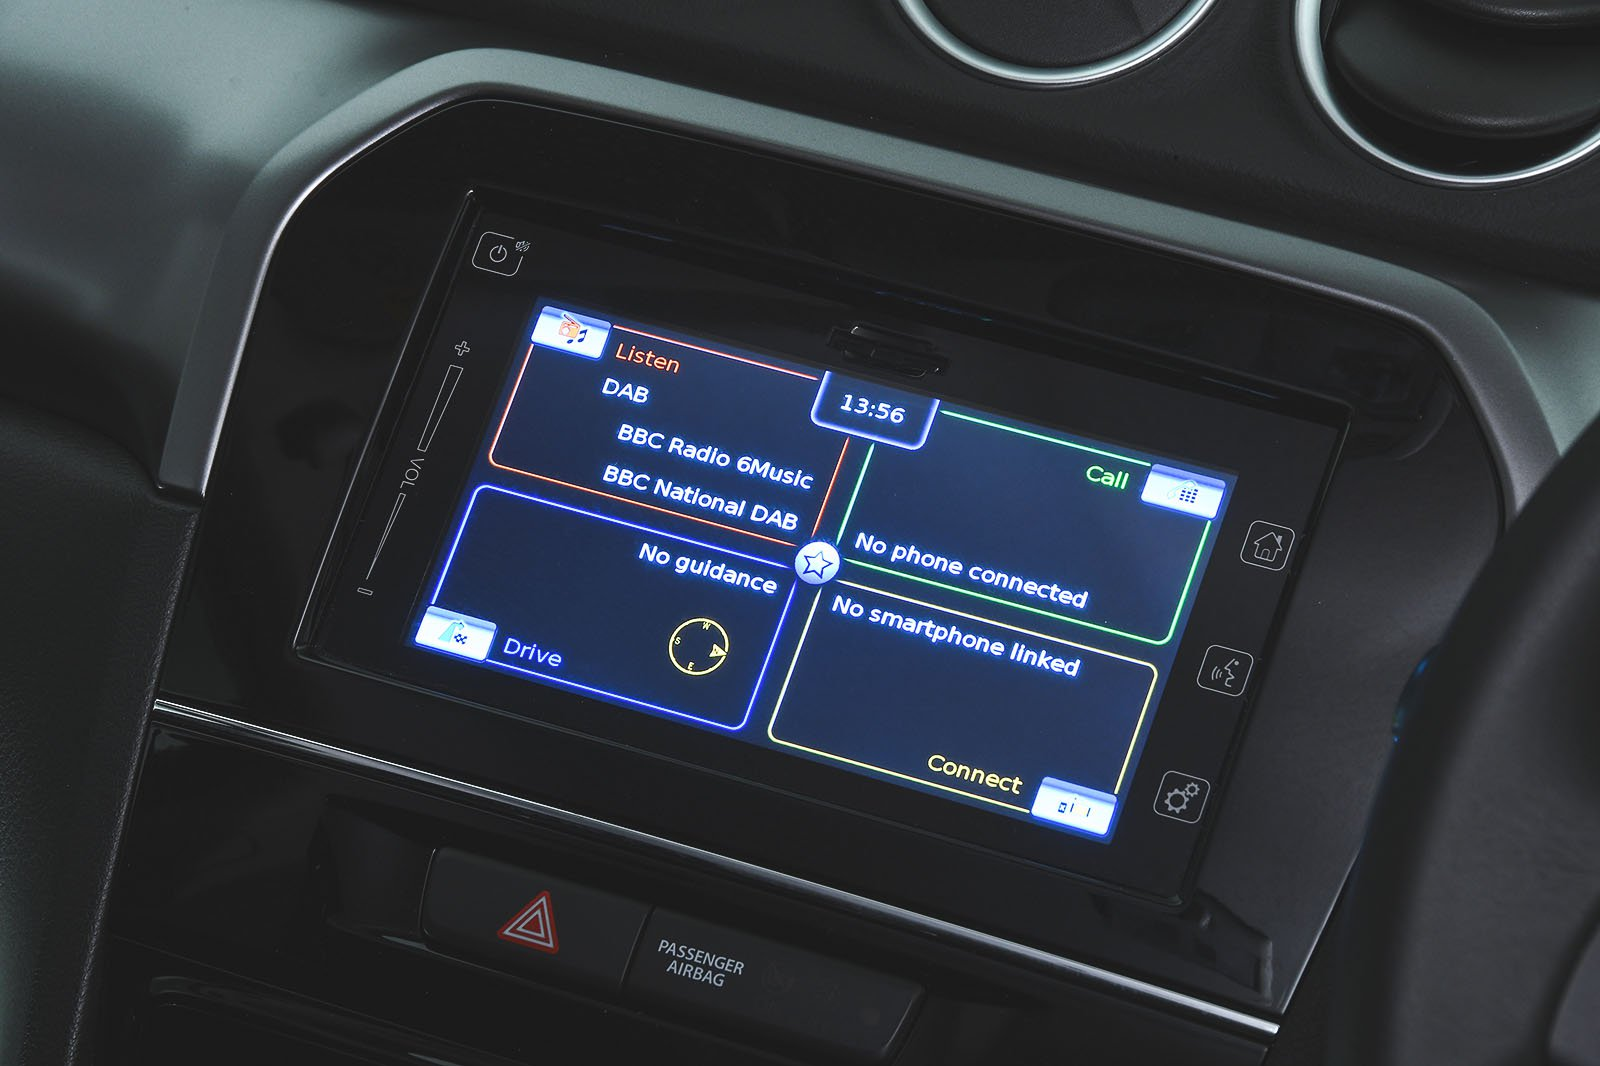 Suzuki Vitara infotainment